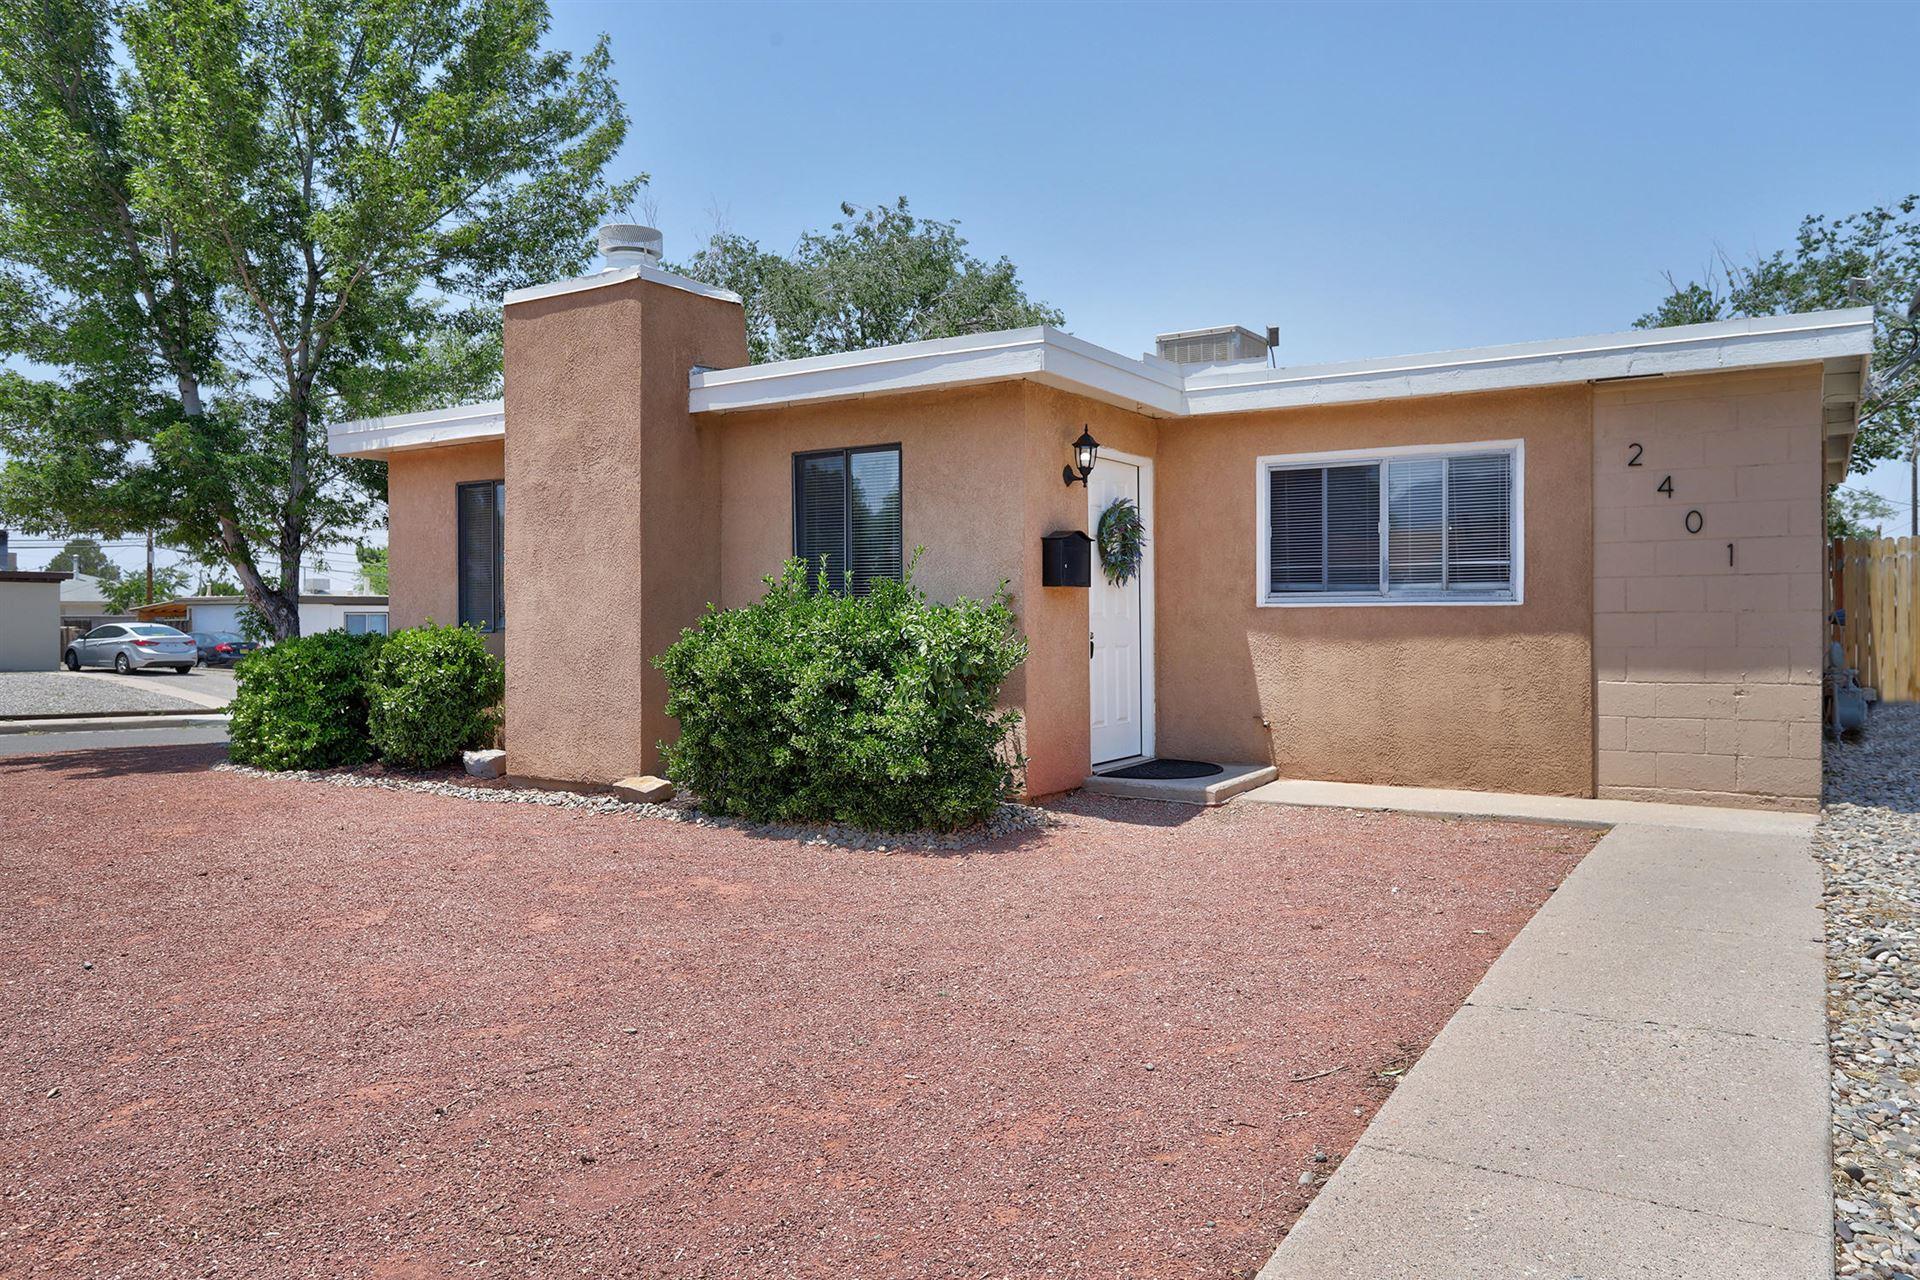 Photo of 2401 MARTHA Street NE, Albuquerque, NM 87112 (MLS # 994786)